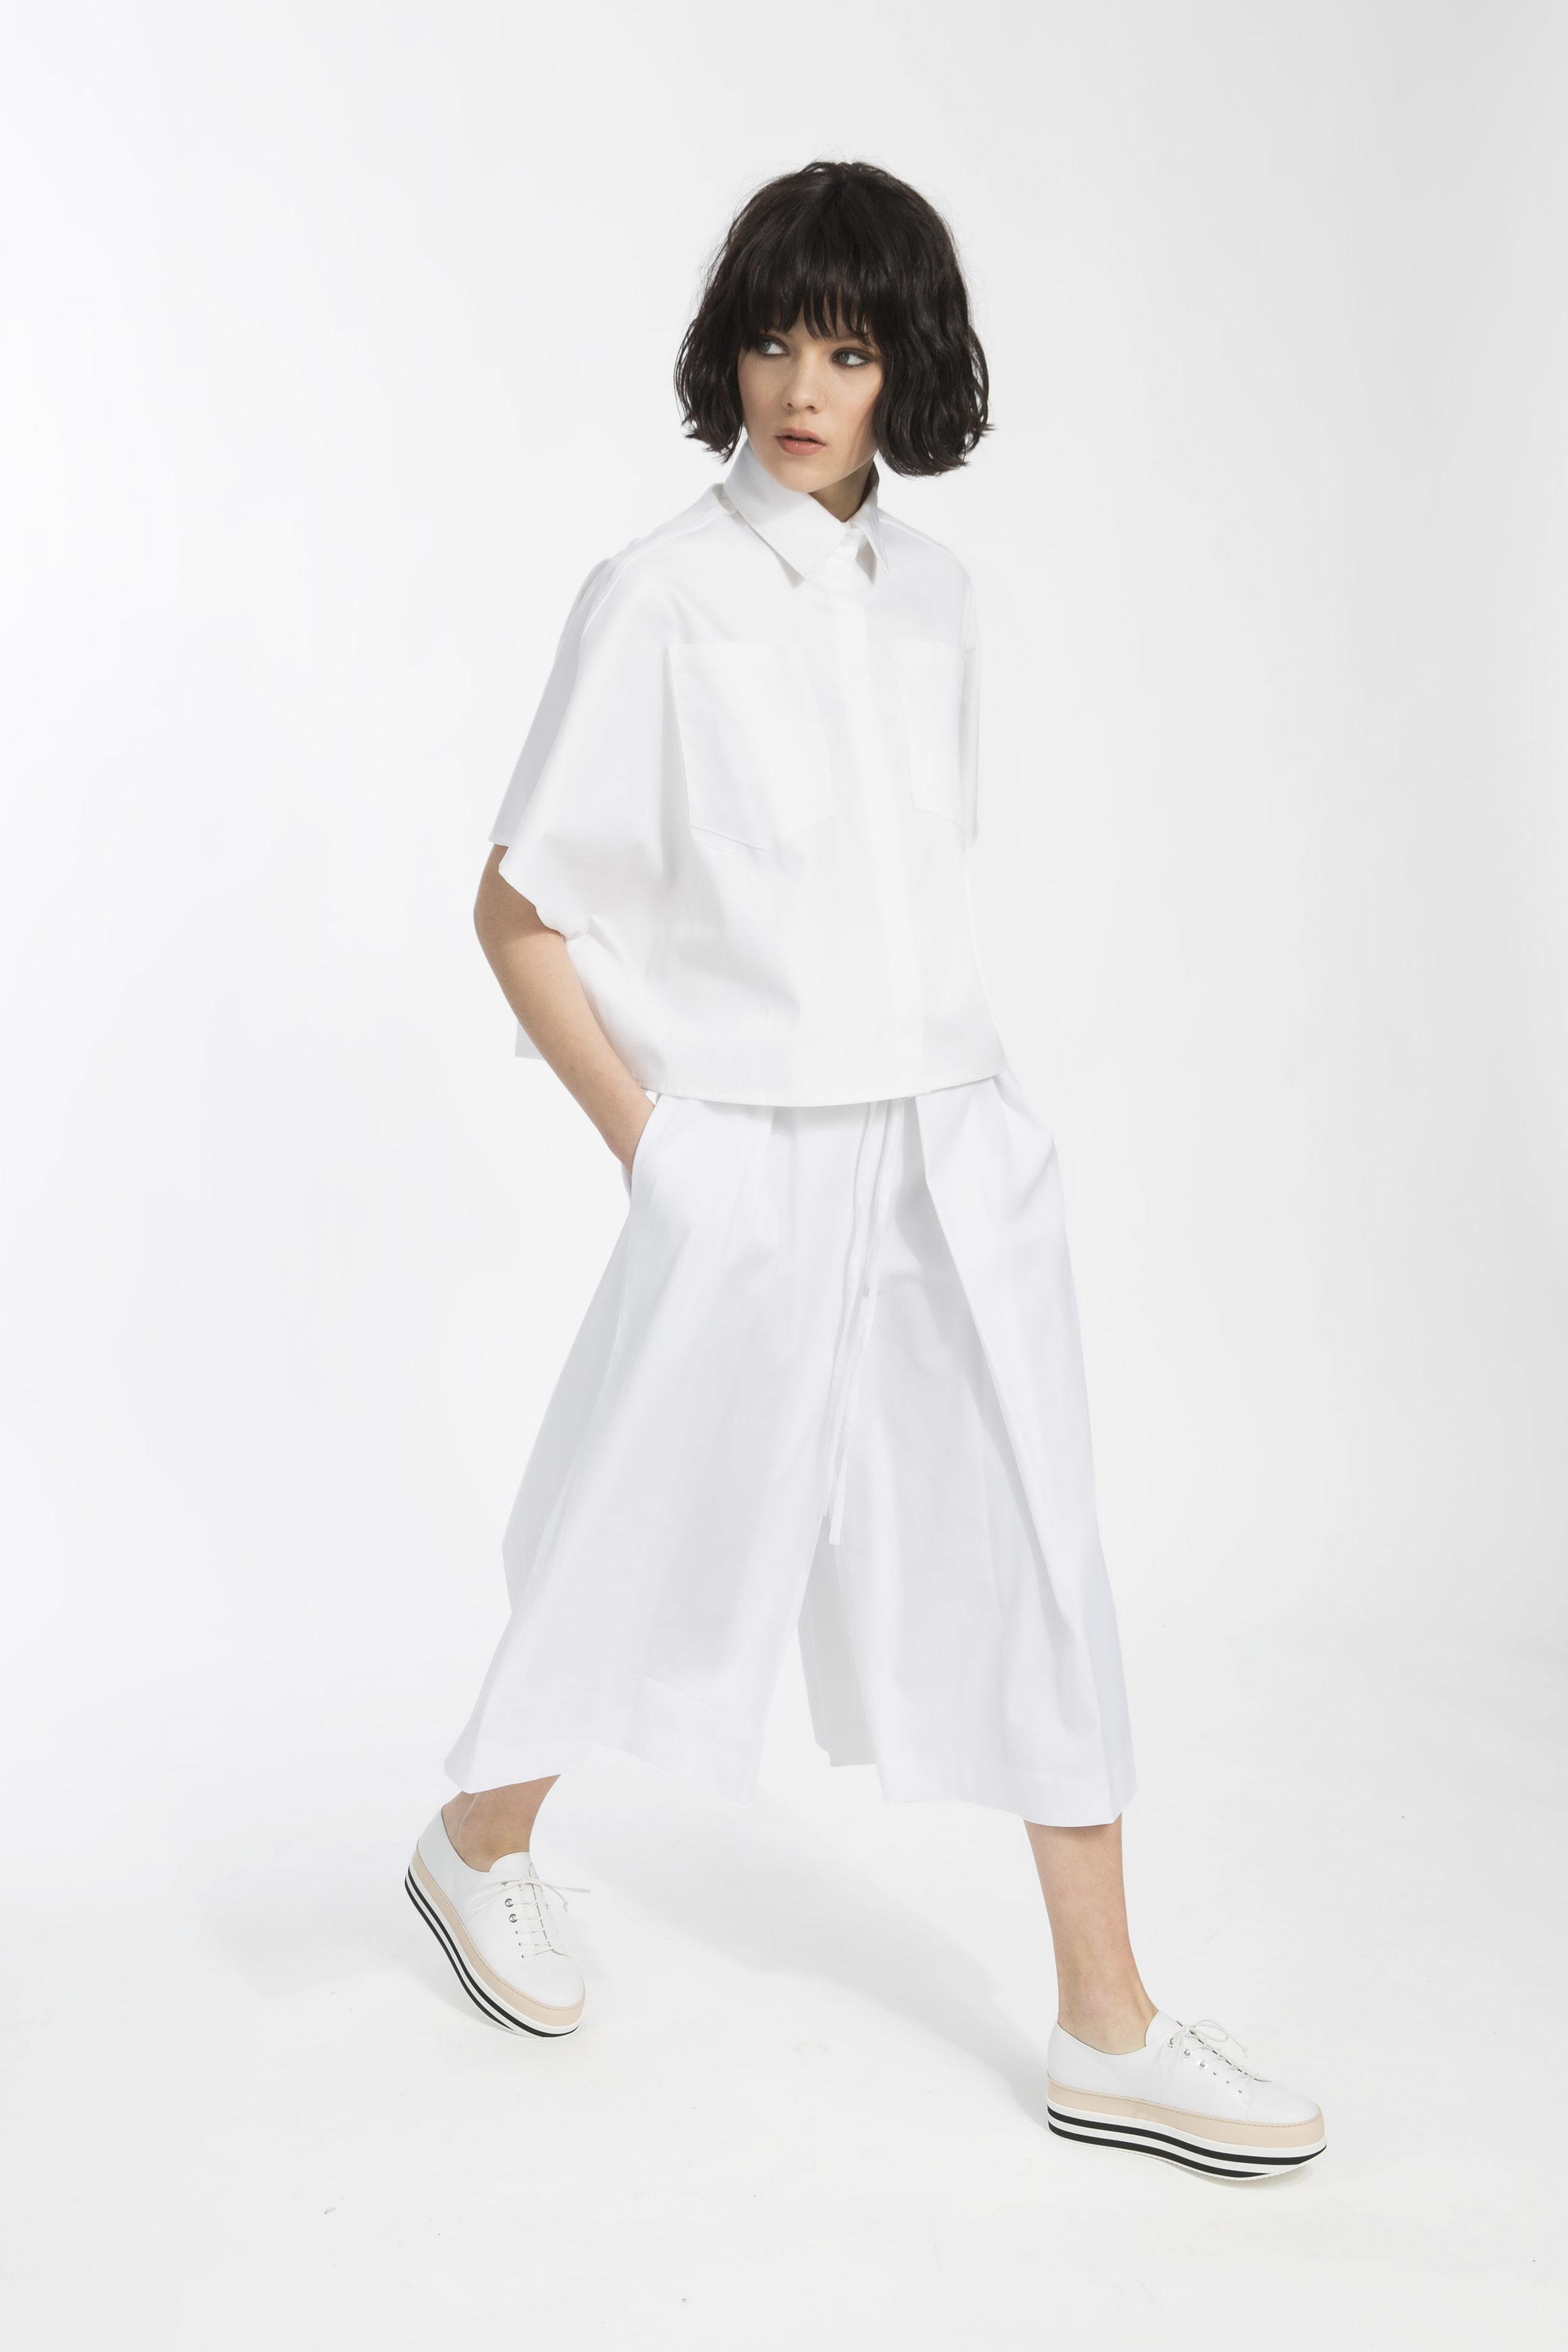 Deena shirt - White cotton popeline shirt